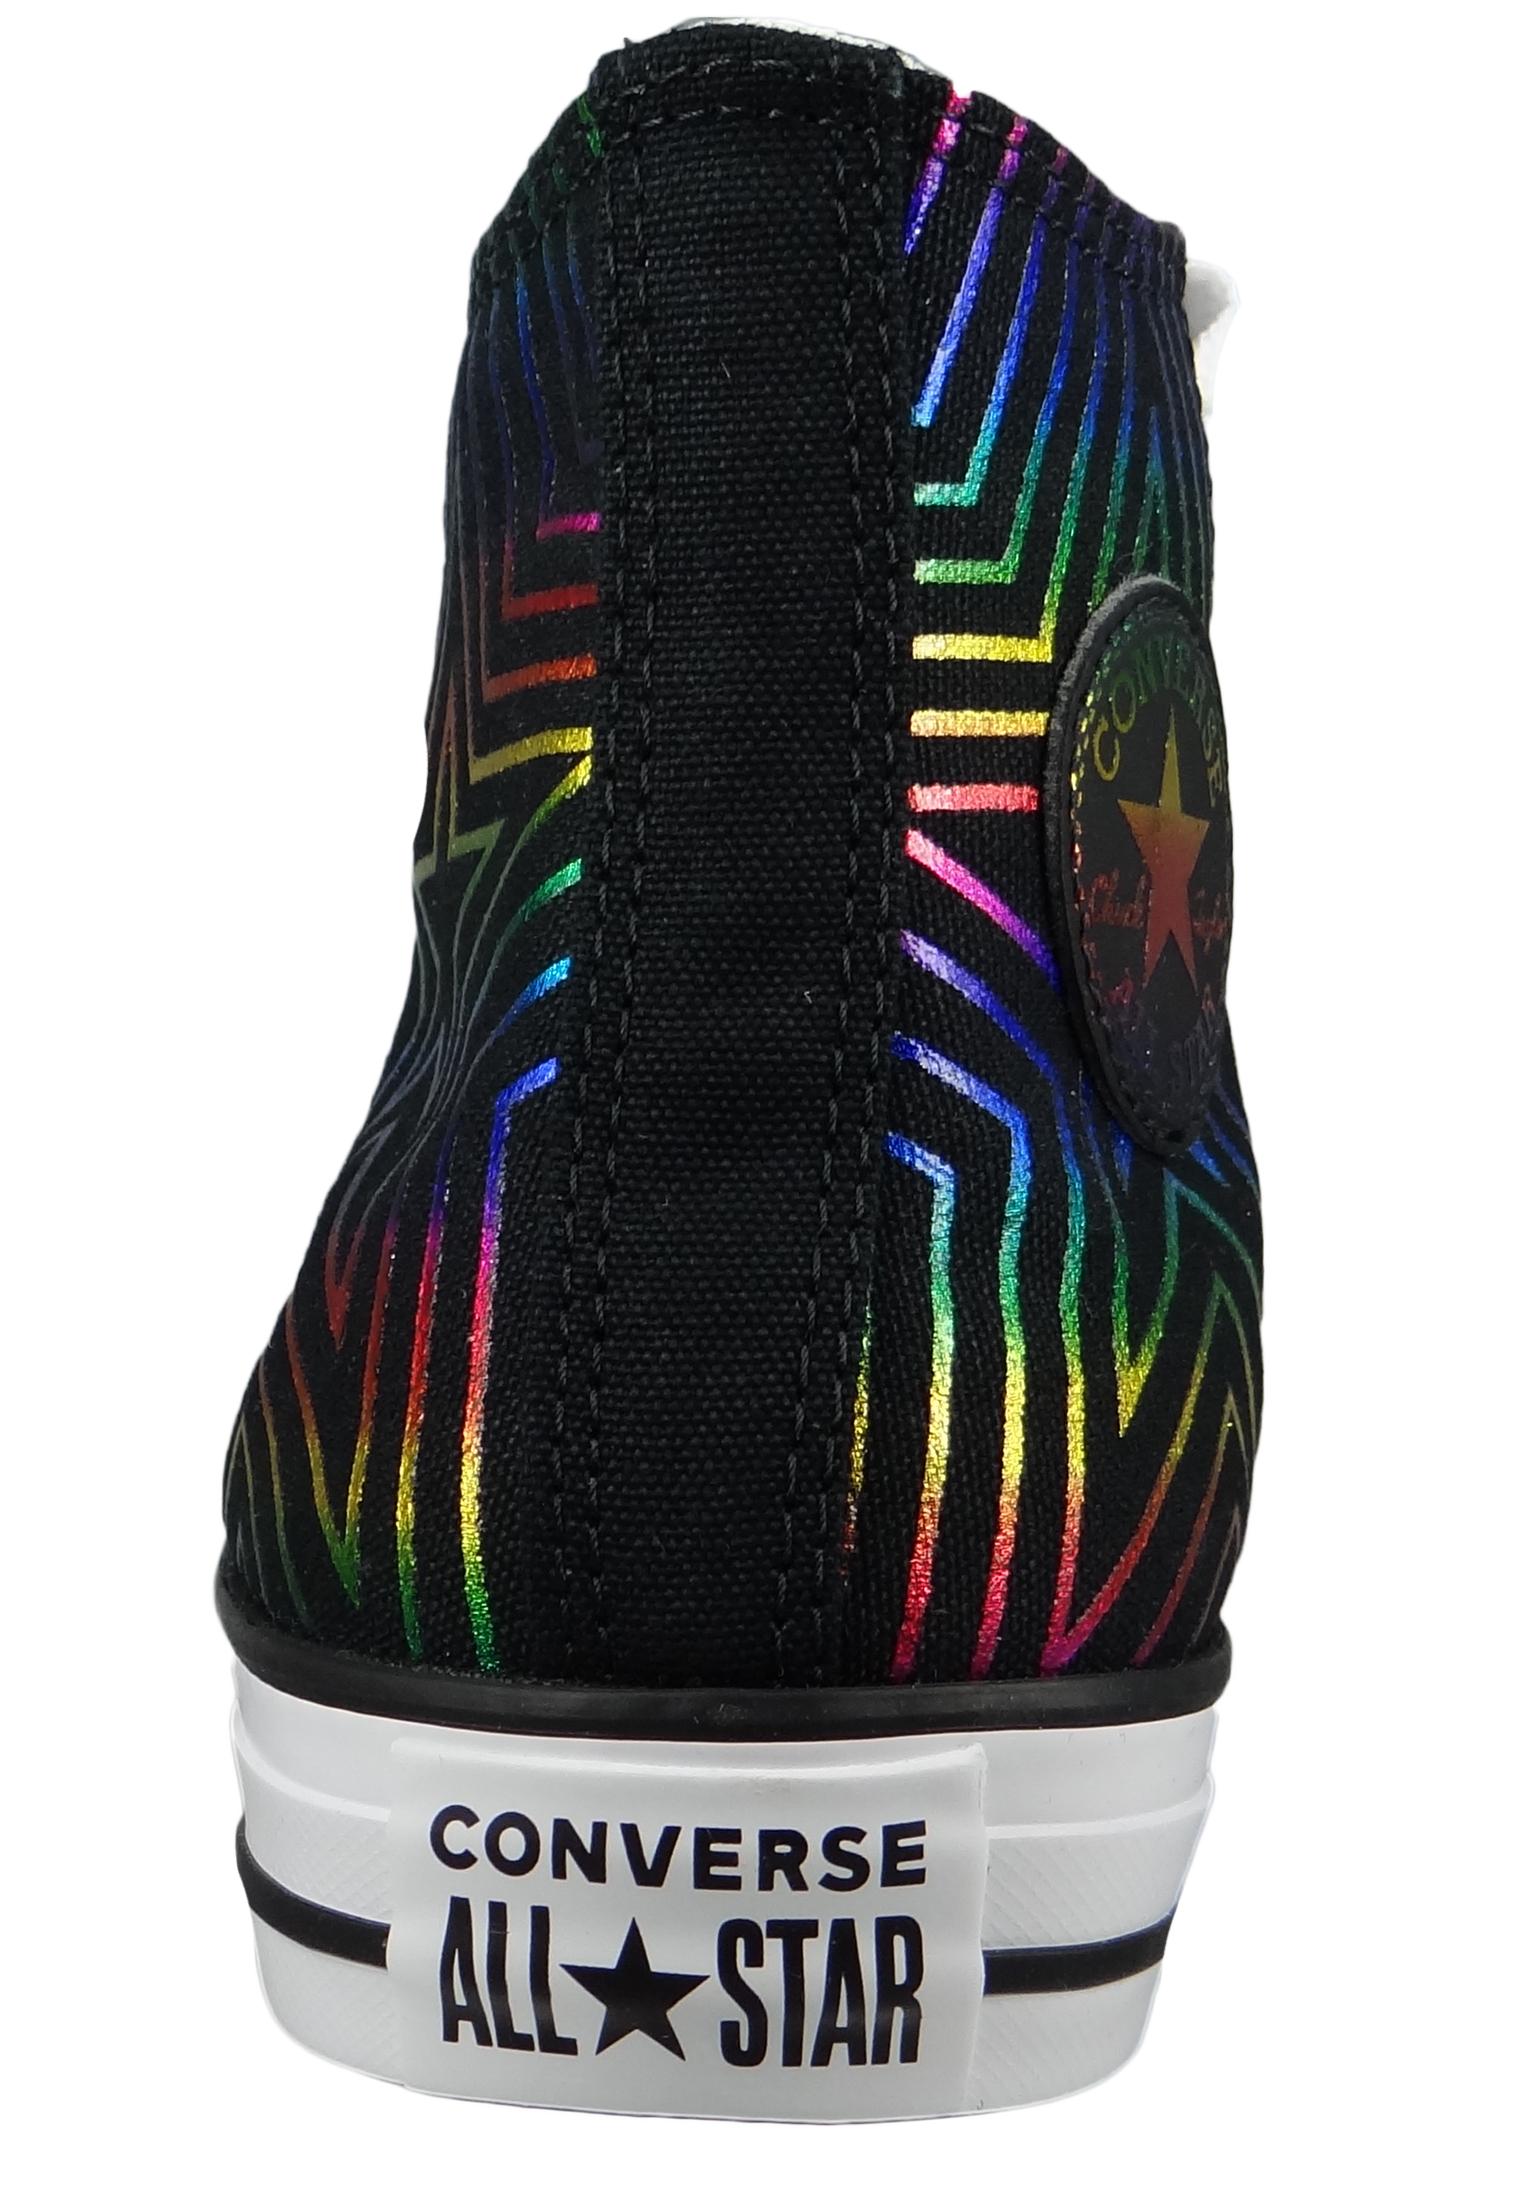 Converse Chucks Schwarz 565395C Chuck Taylor All Star HI Black White White